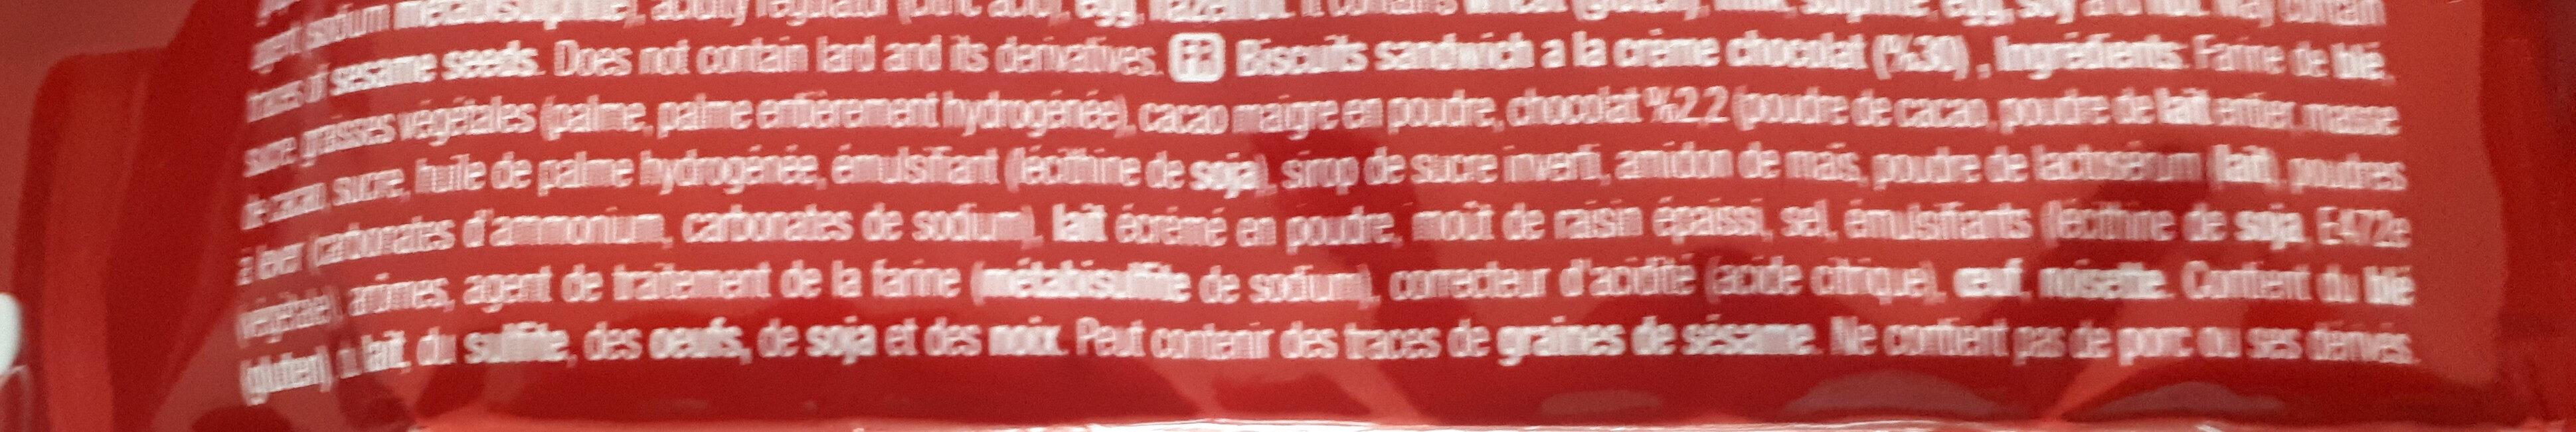 Ikram - Ingrediënten - fr